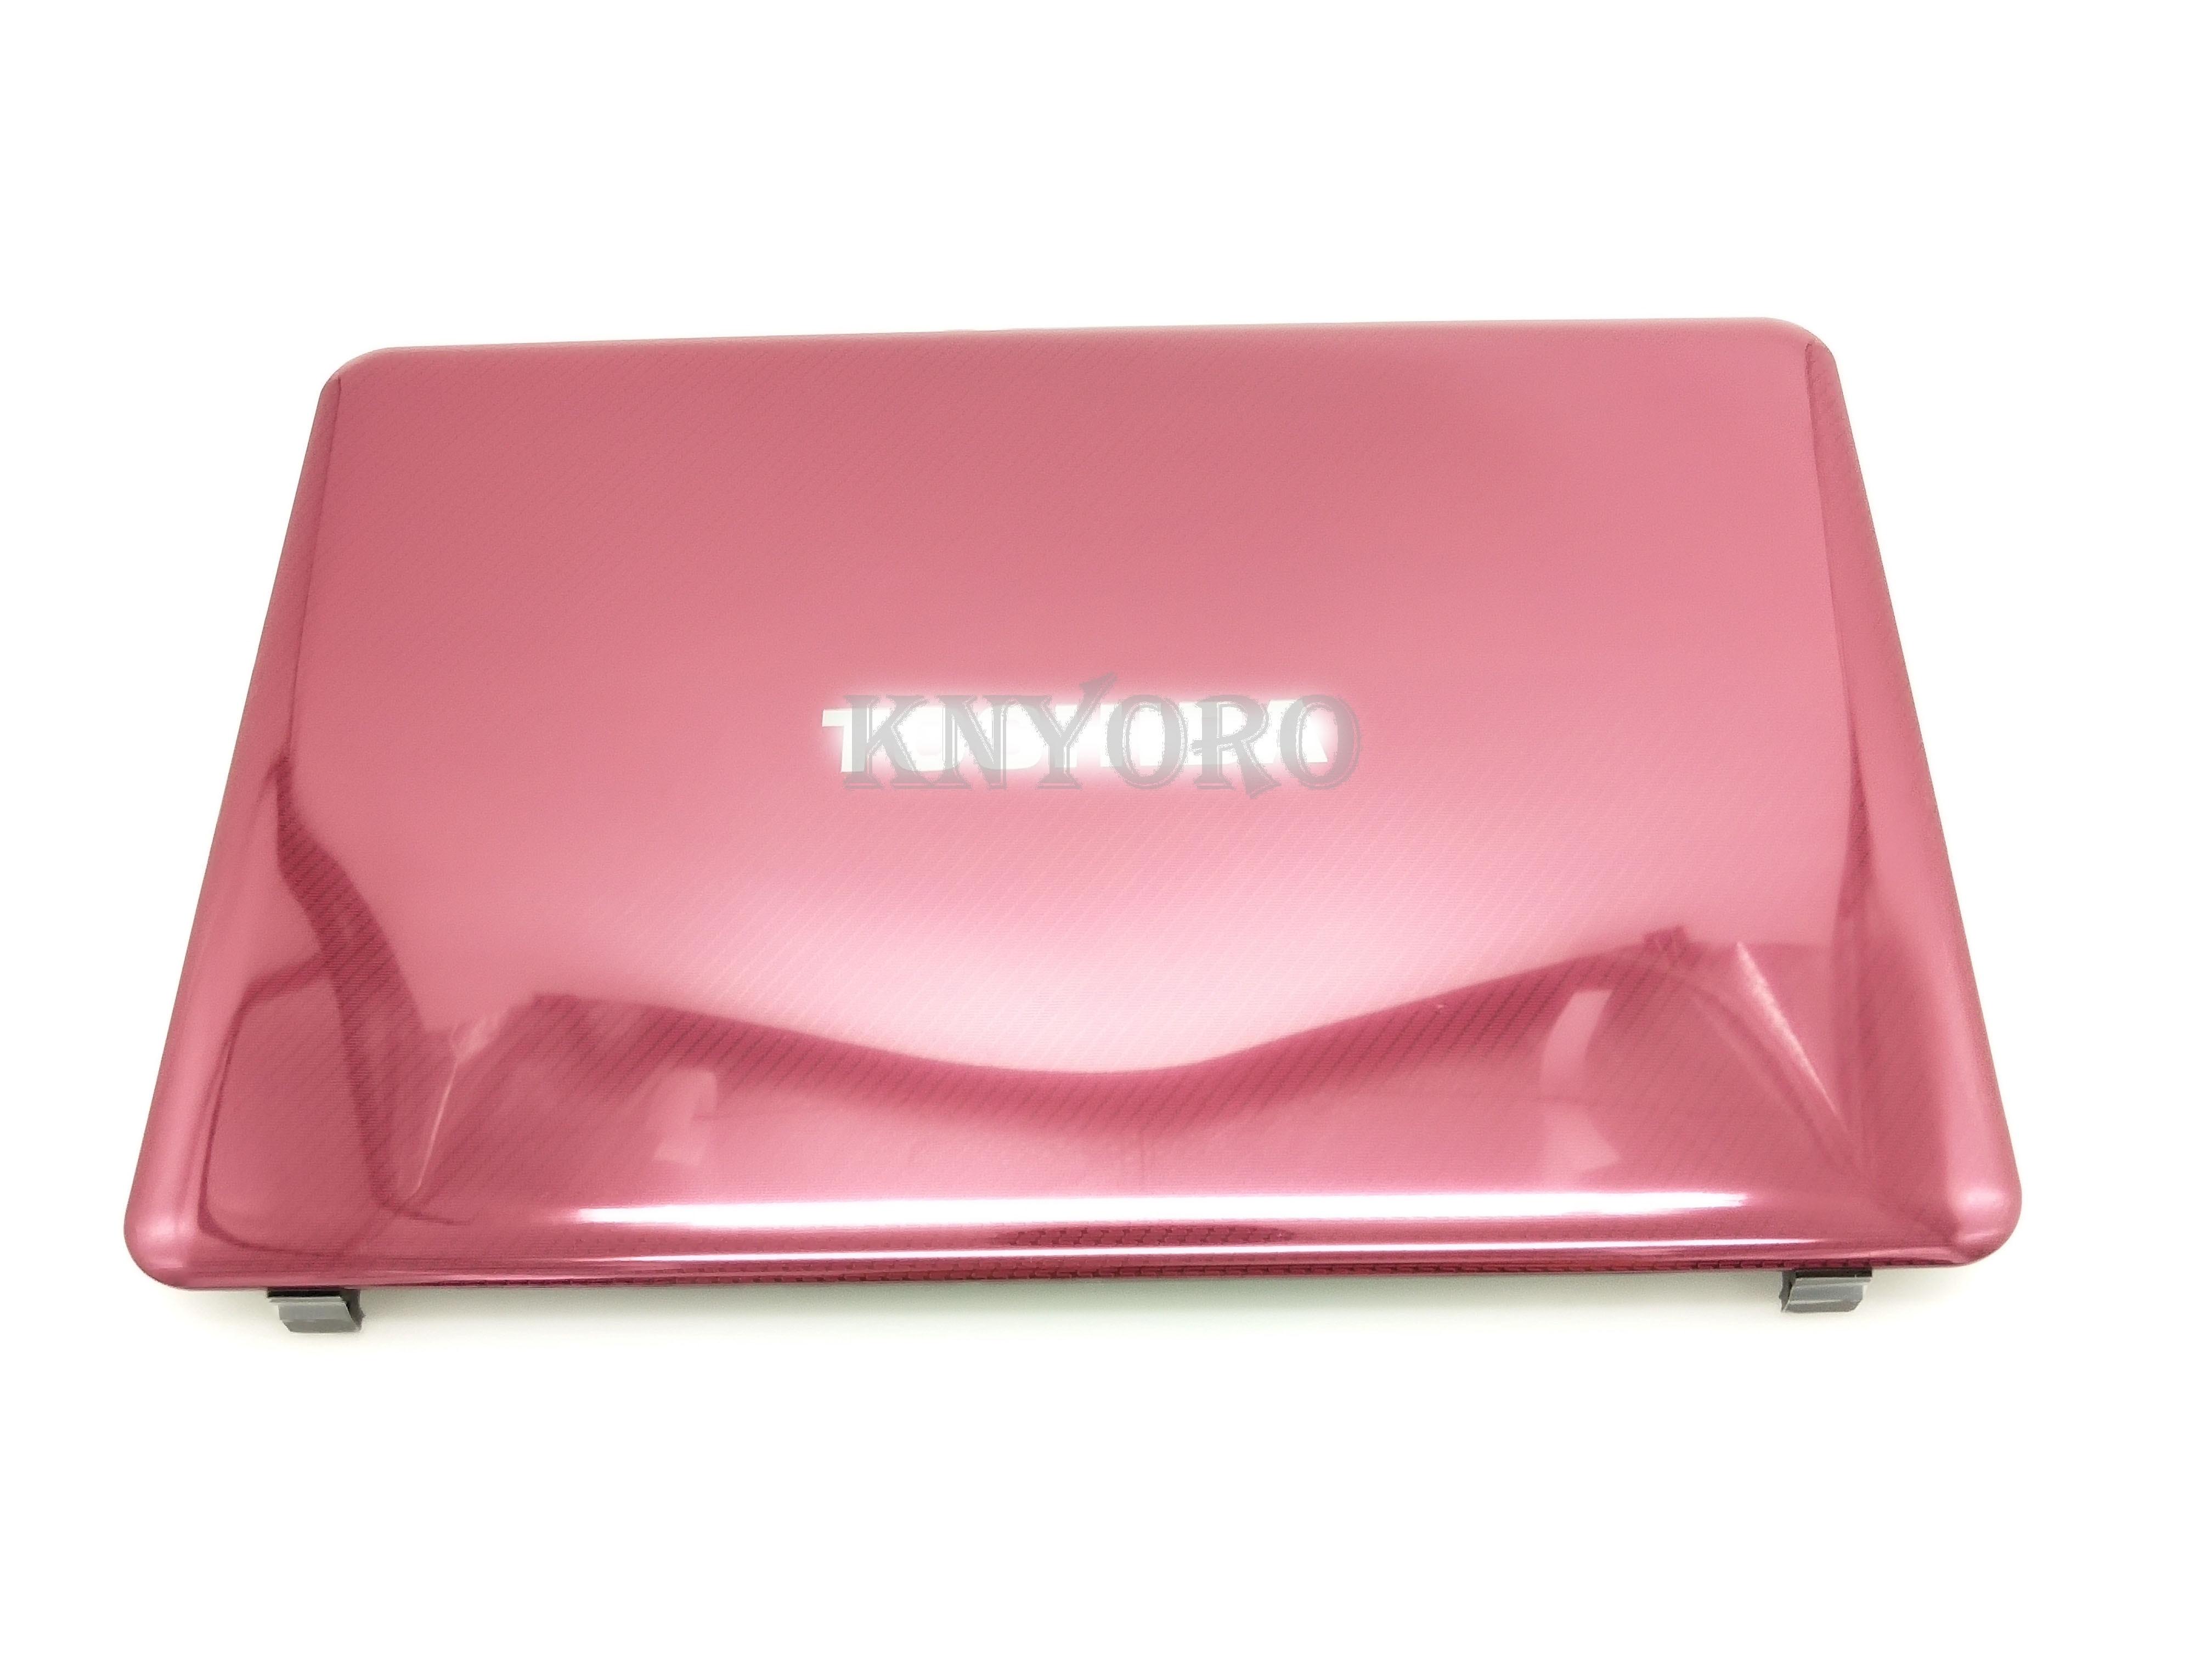 Nuevo para Toshiba Satellite LCD contraportada pink ZYE38BY4LC01A0121017